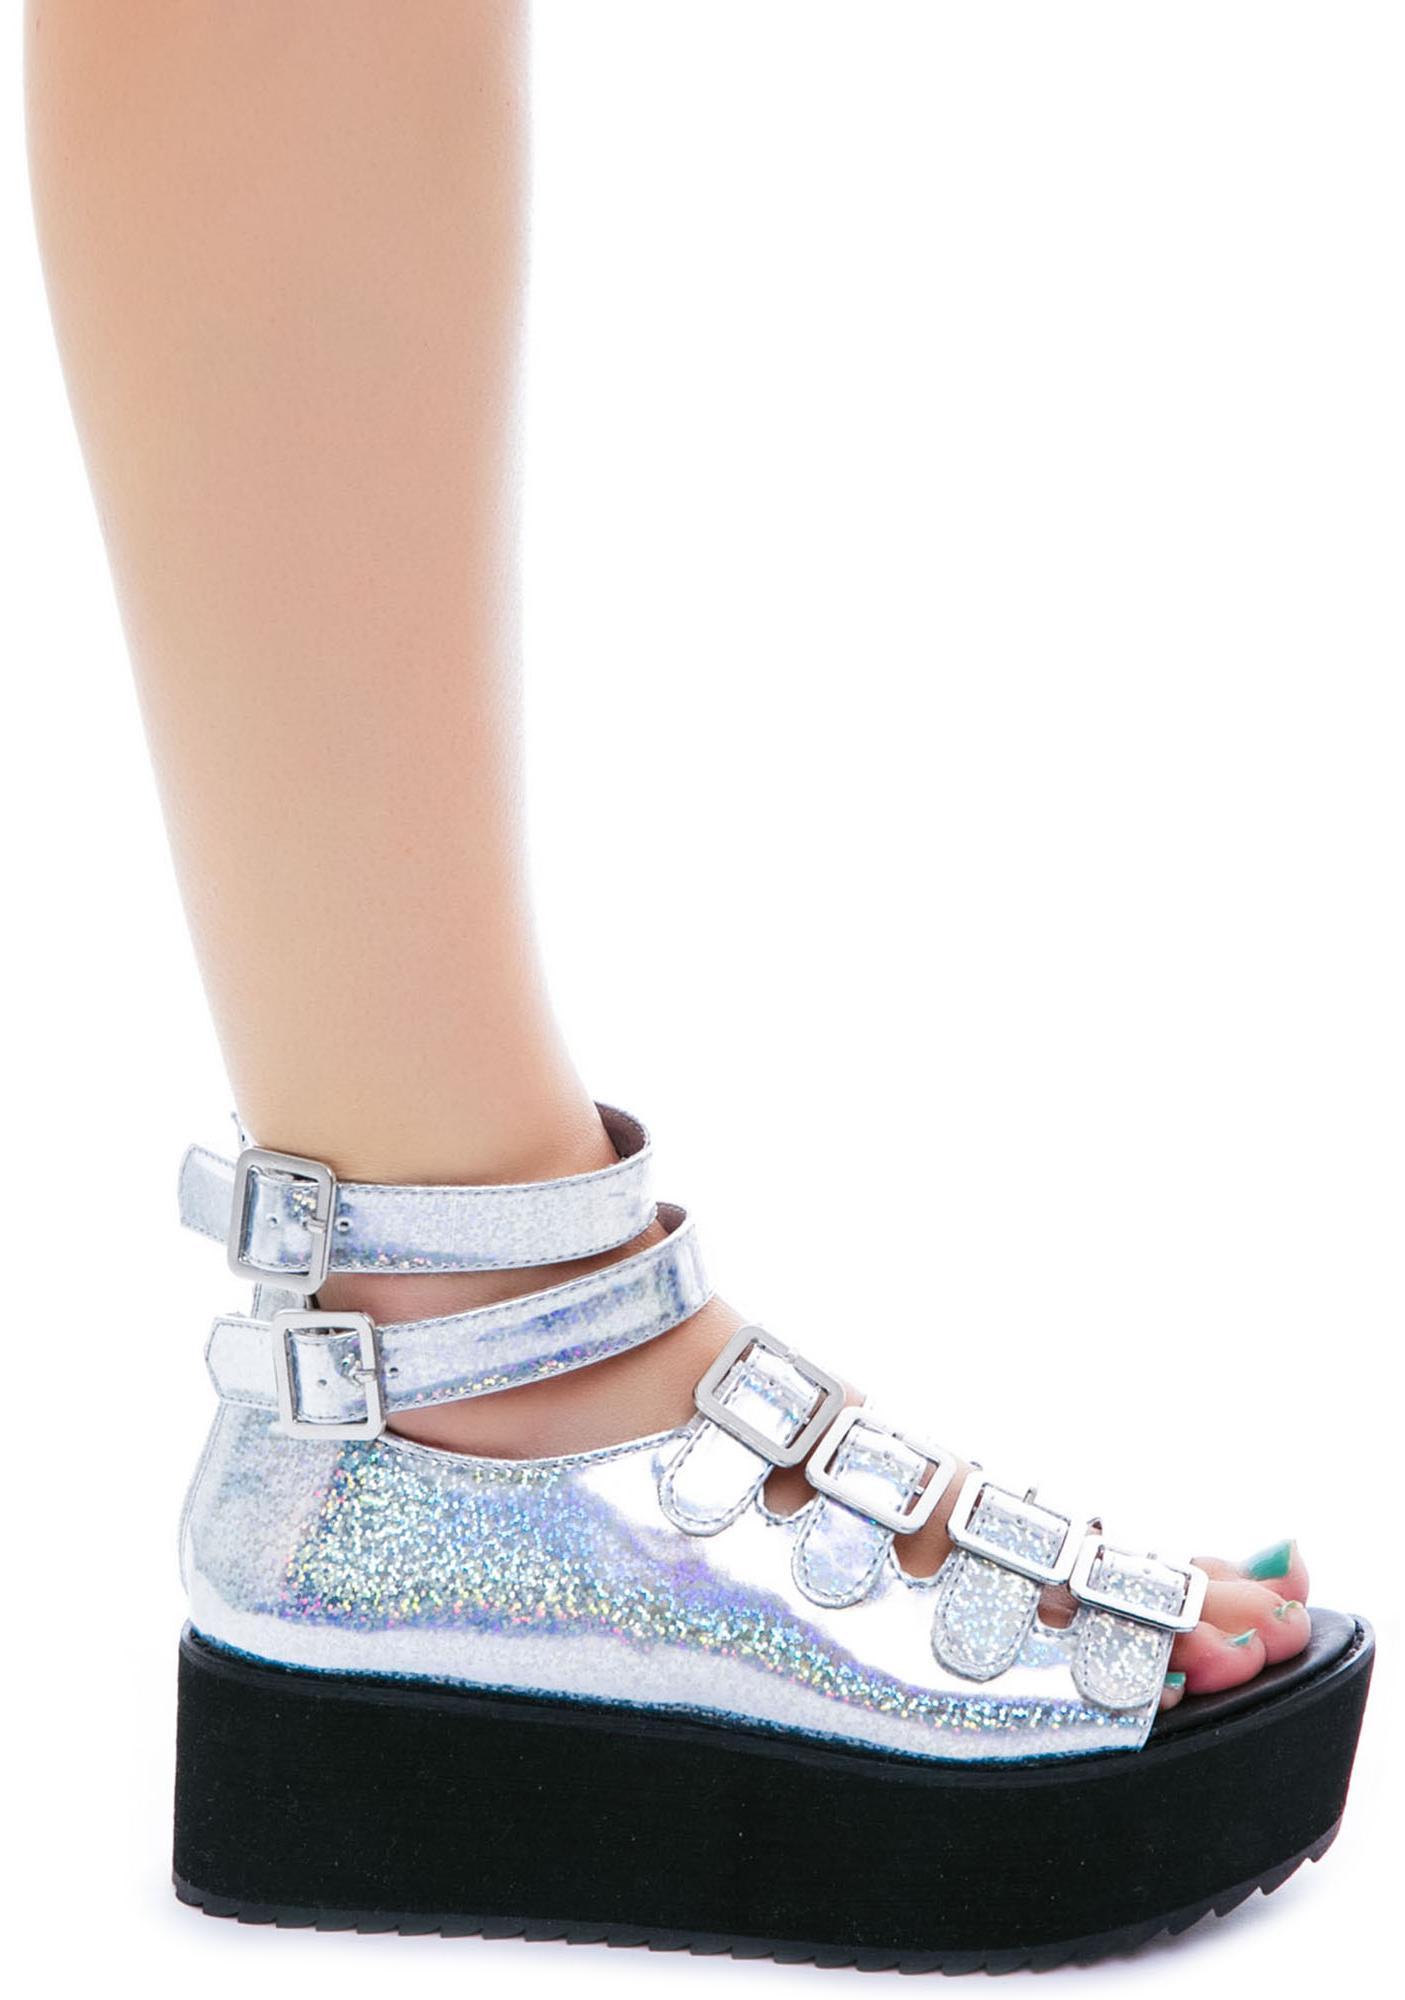 Y.R.U. Mirage Flatform Sandal